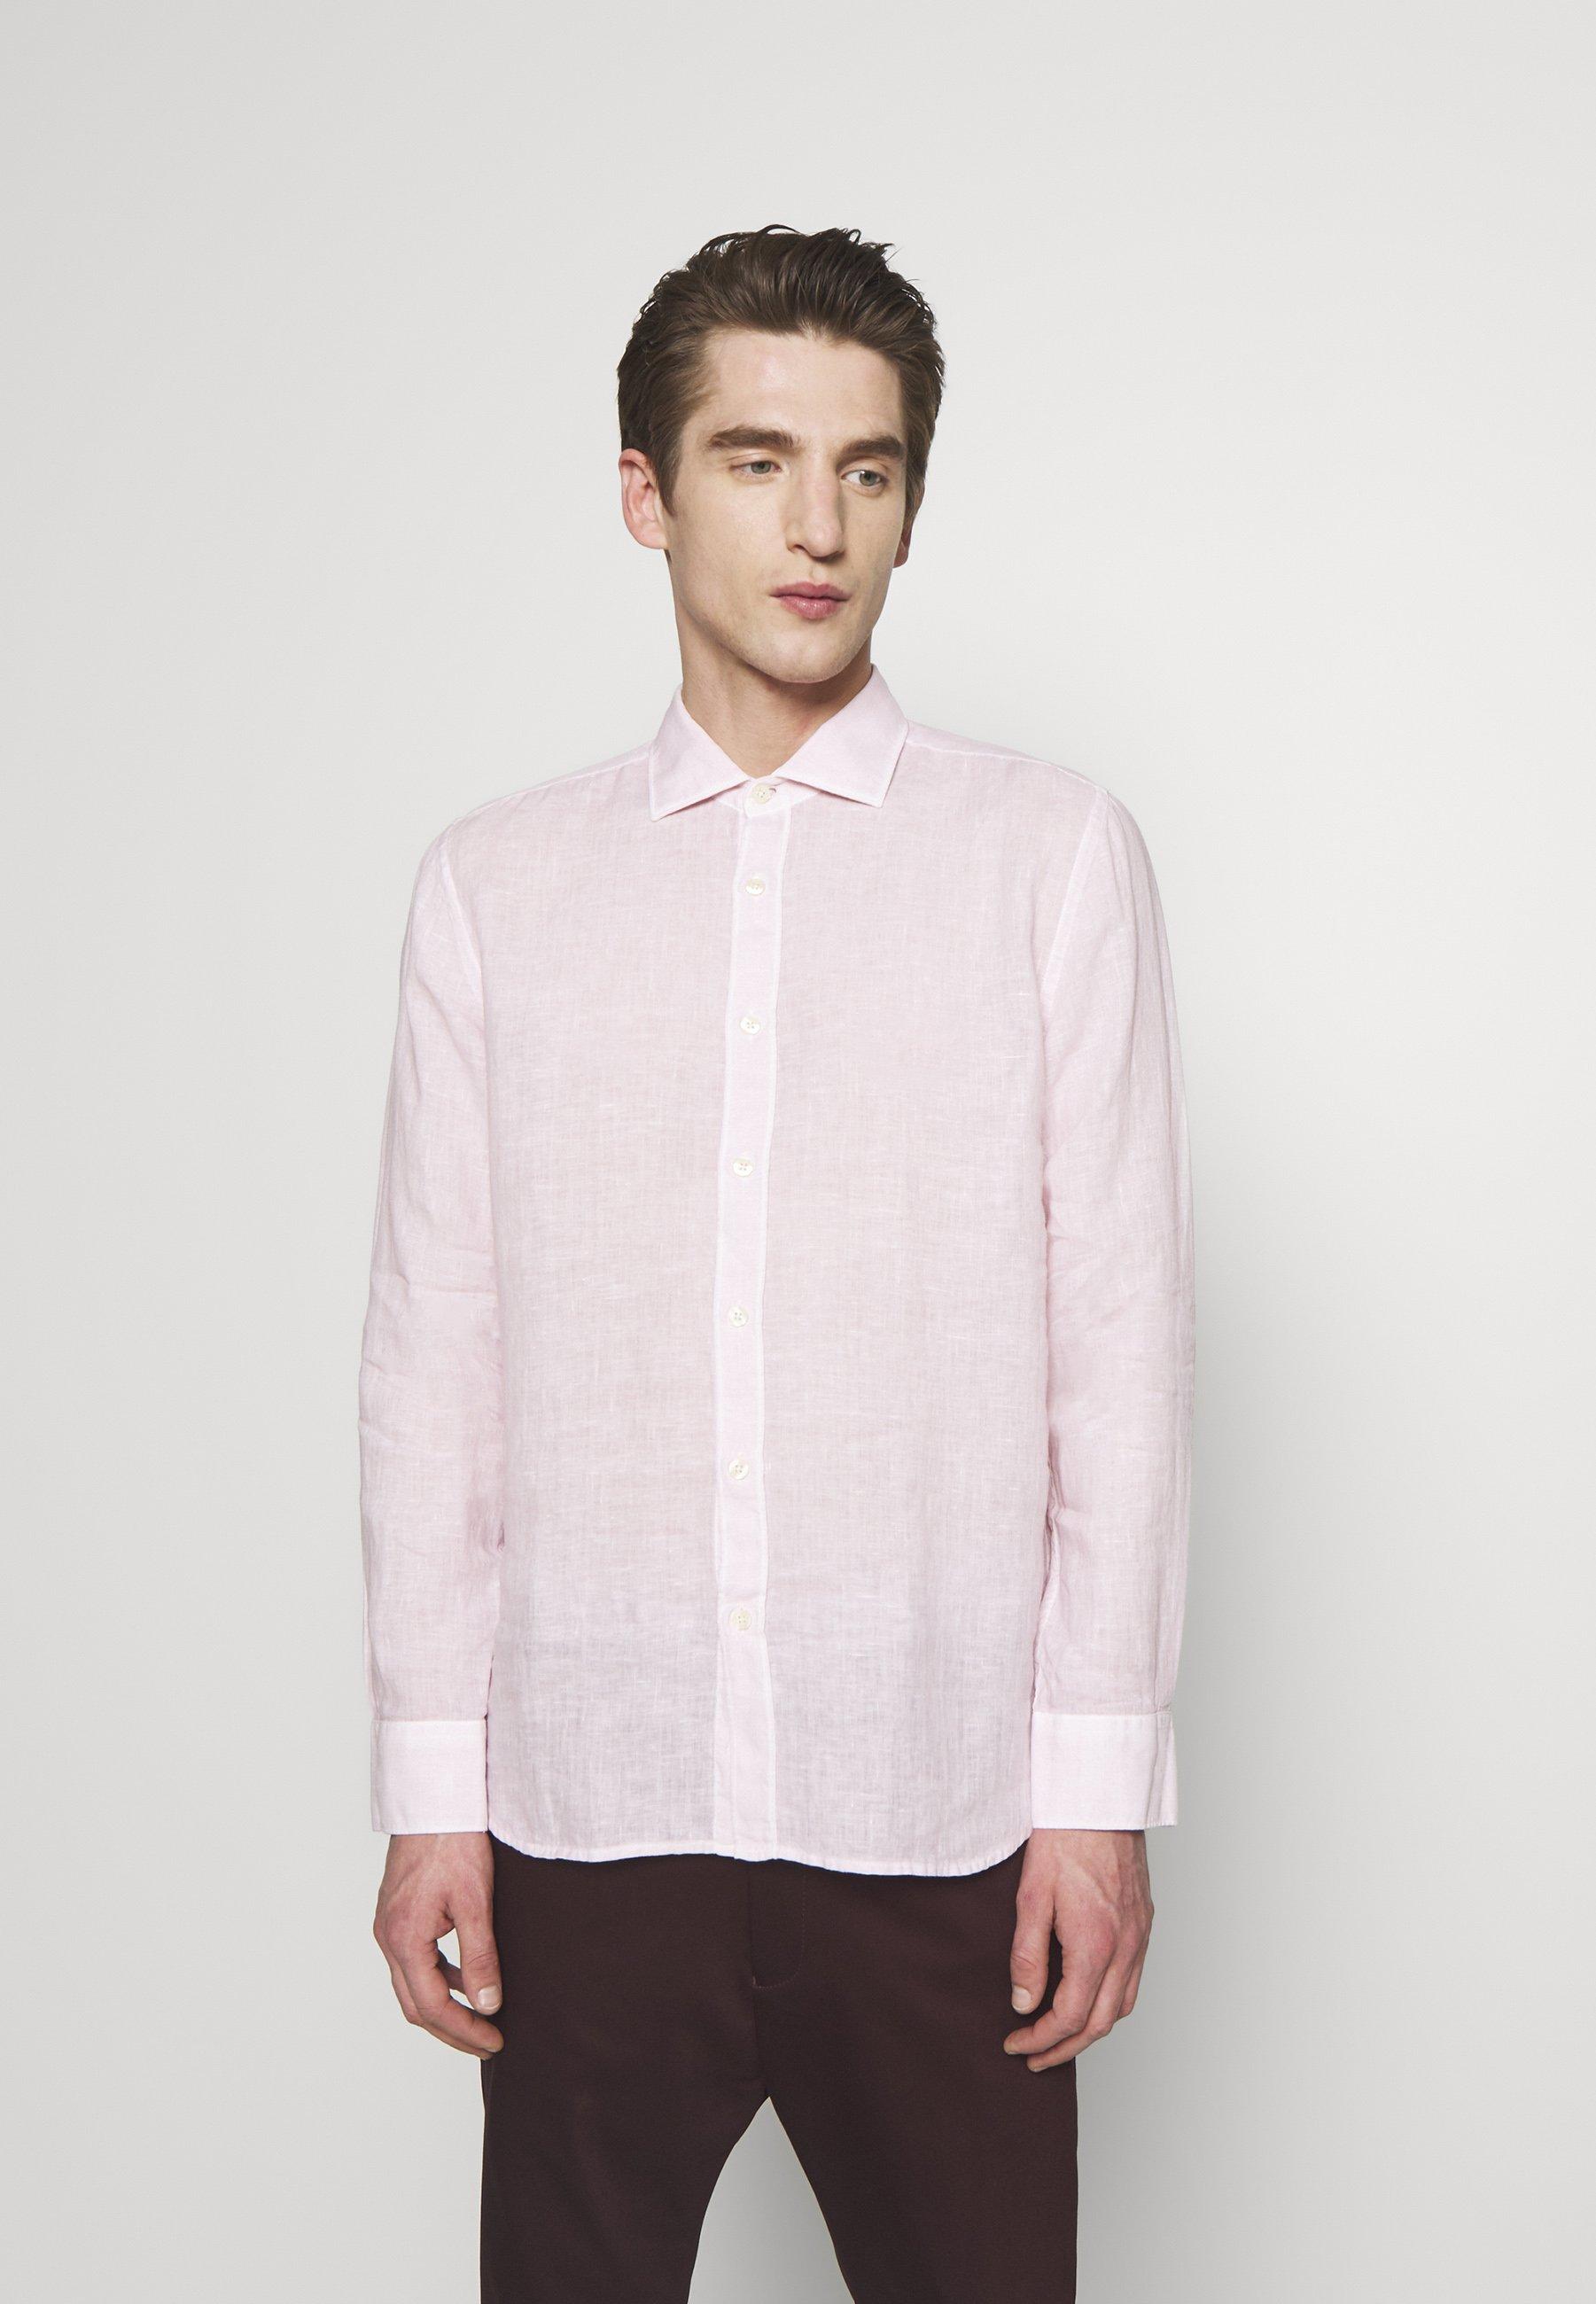 120% Lino Koszula - pink soft fade